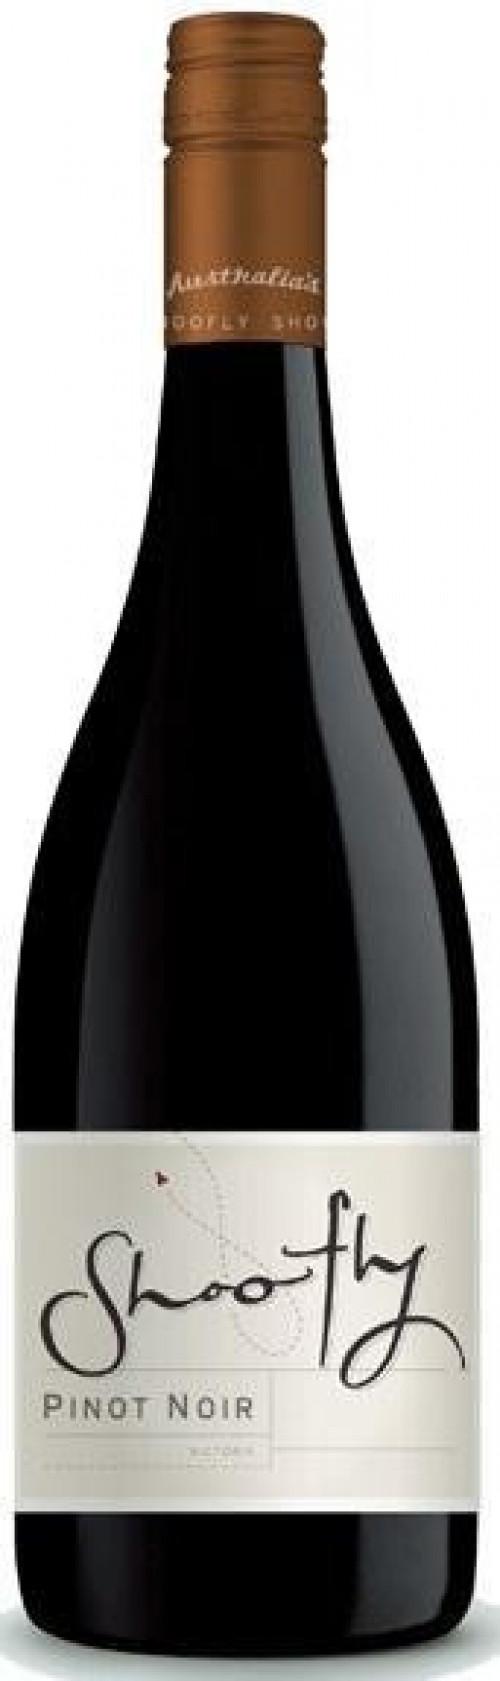 Shoofly Pinot Noir 750ml